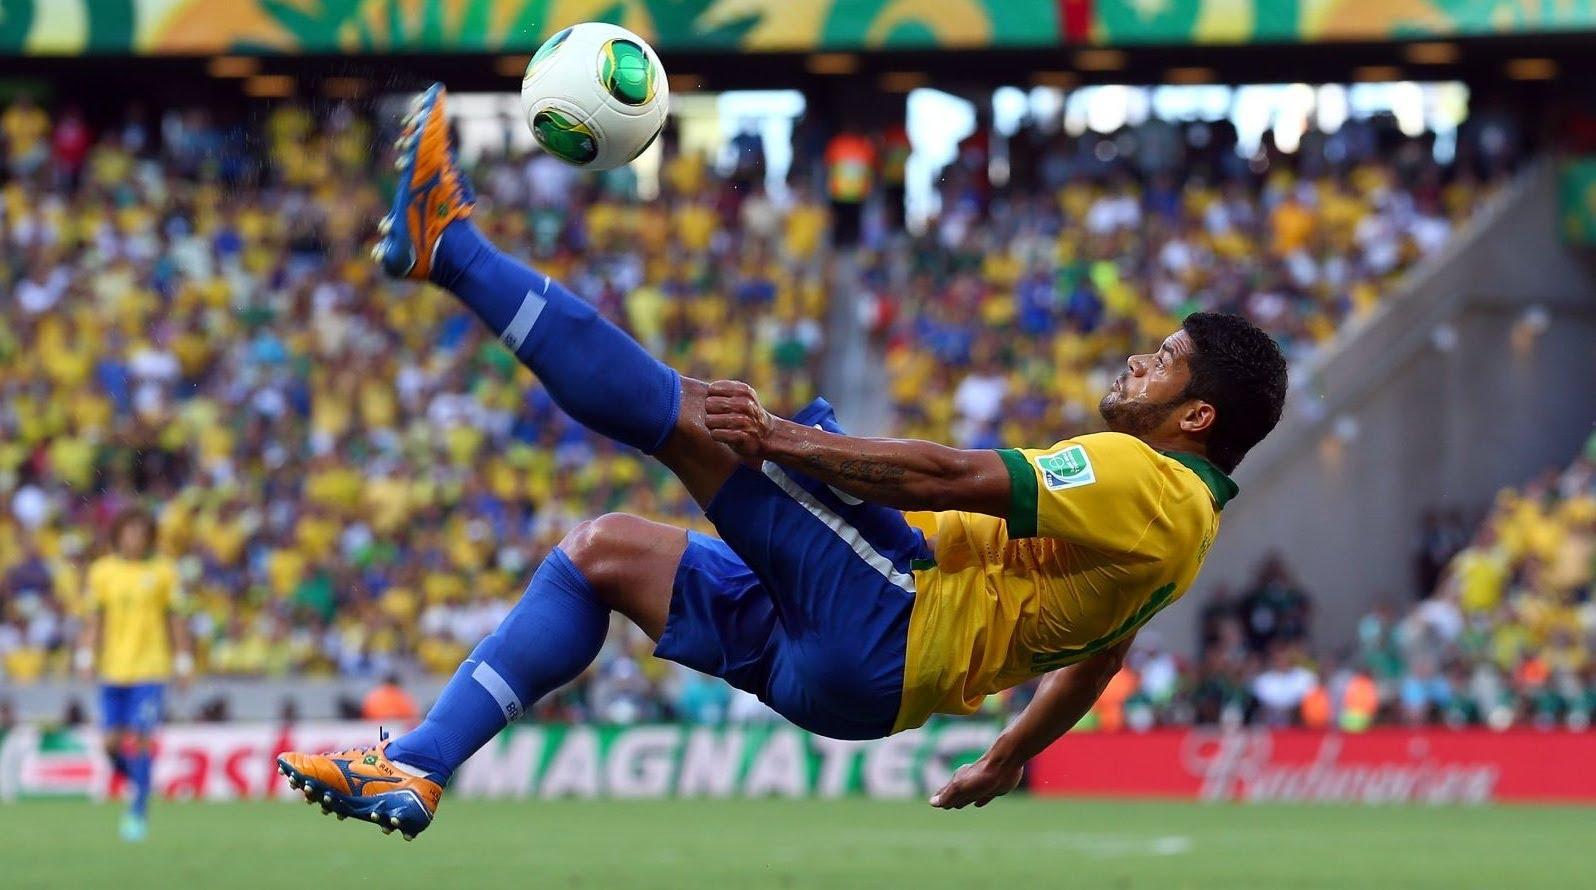 Passion Hulk